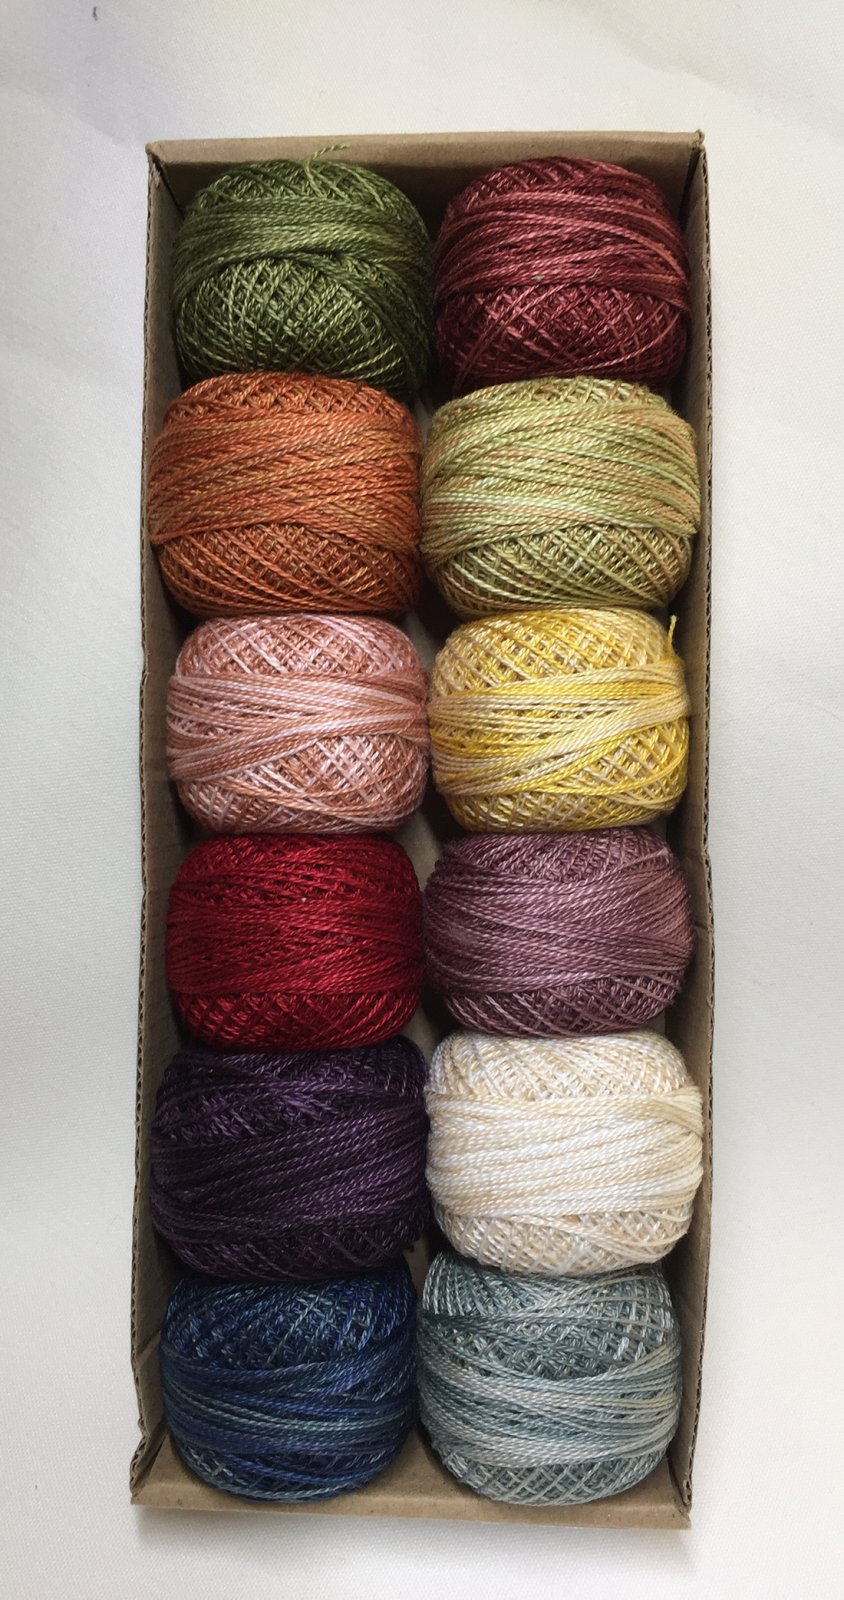 P12 Valdani - Fan Favorite Thread Collection